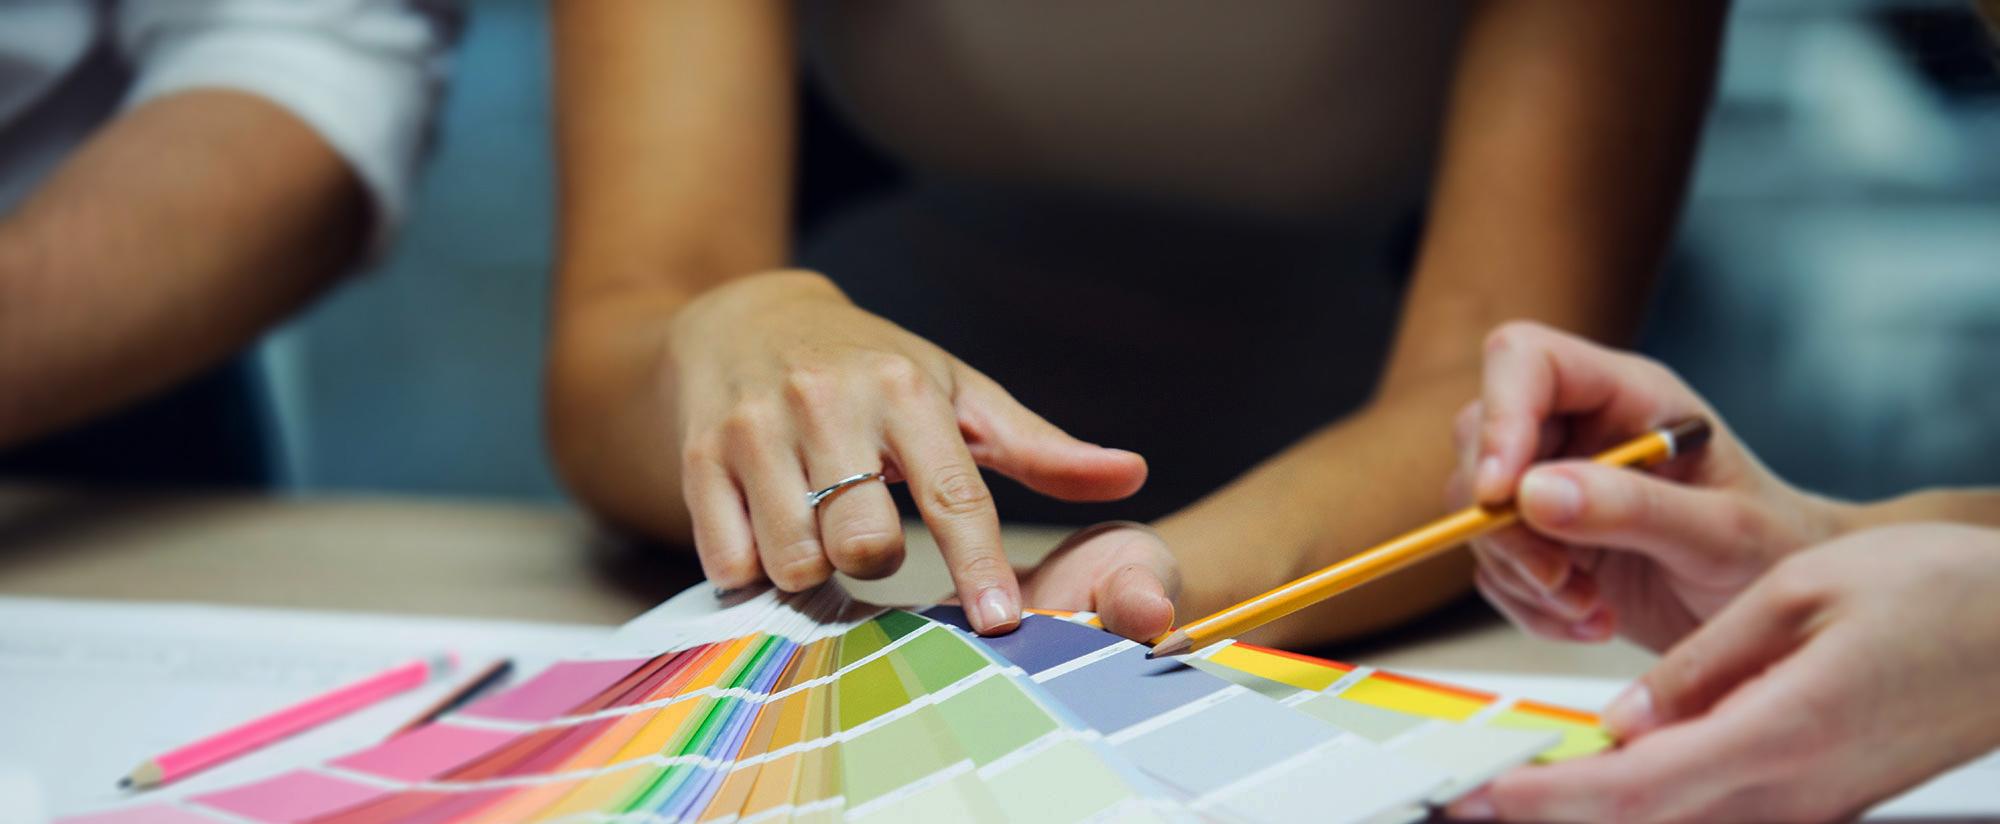 Pantone color strips